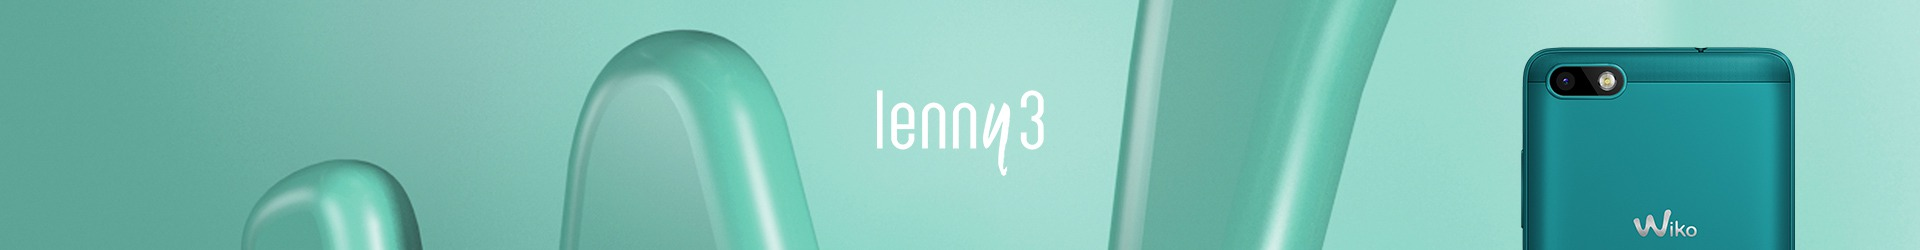 lenny_3